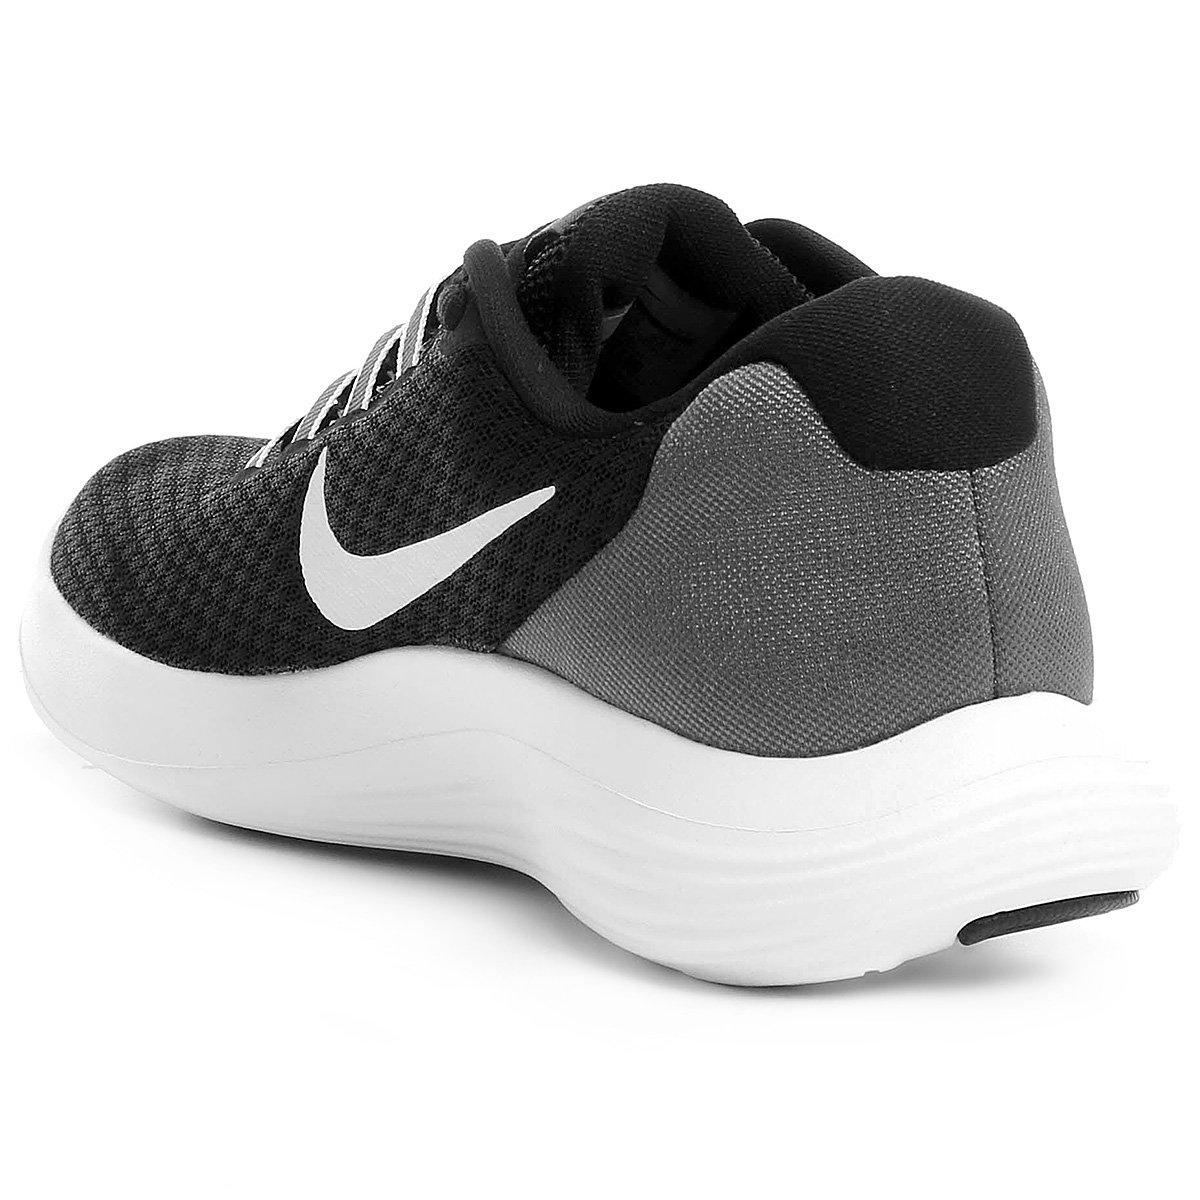 Tênis Nike Lunarconverge Feminino - Compre Agora  24970ed36dd1a